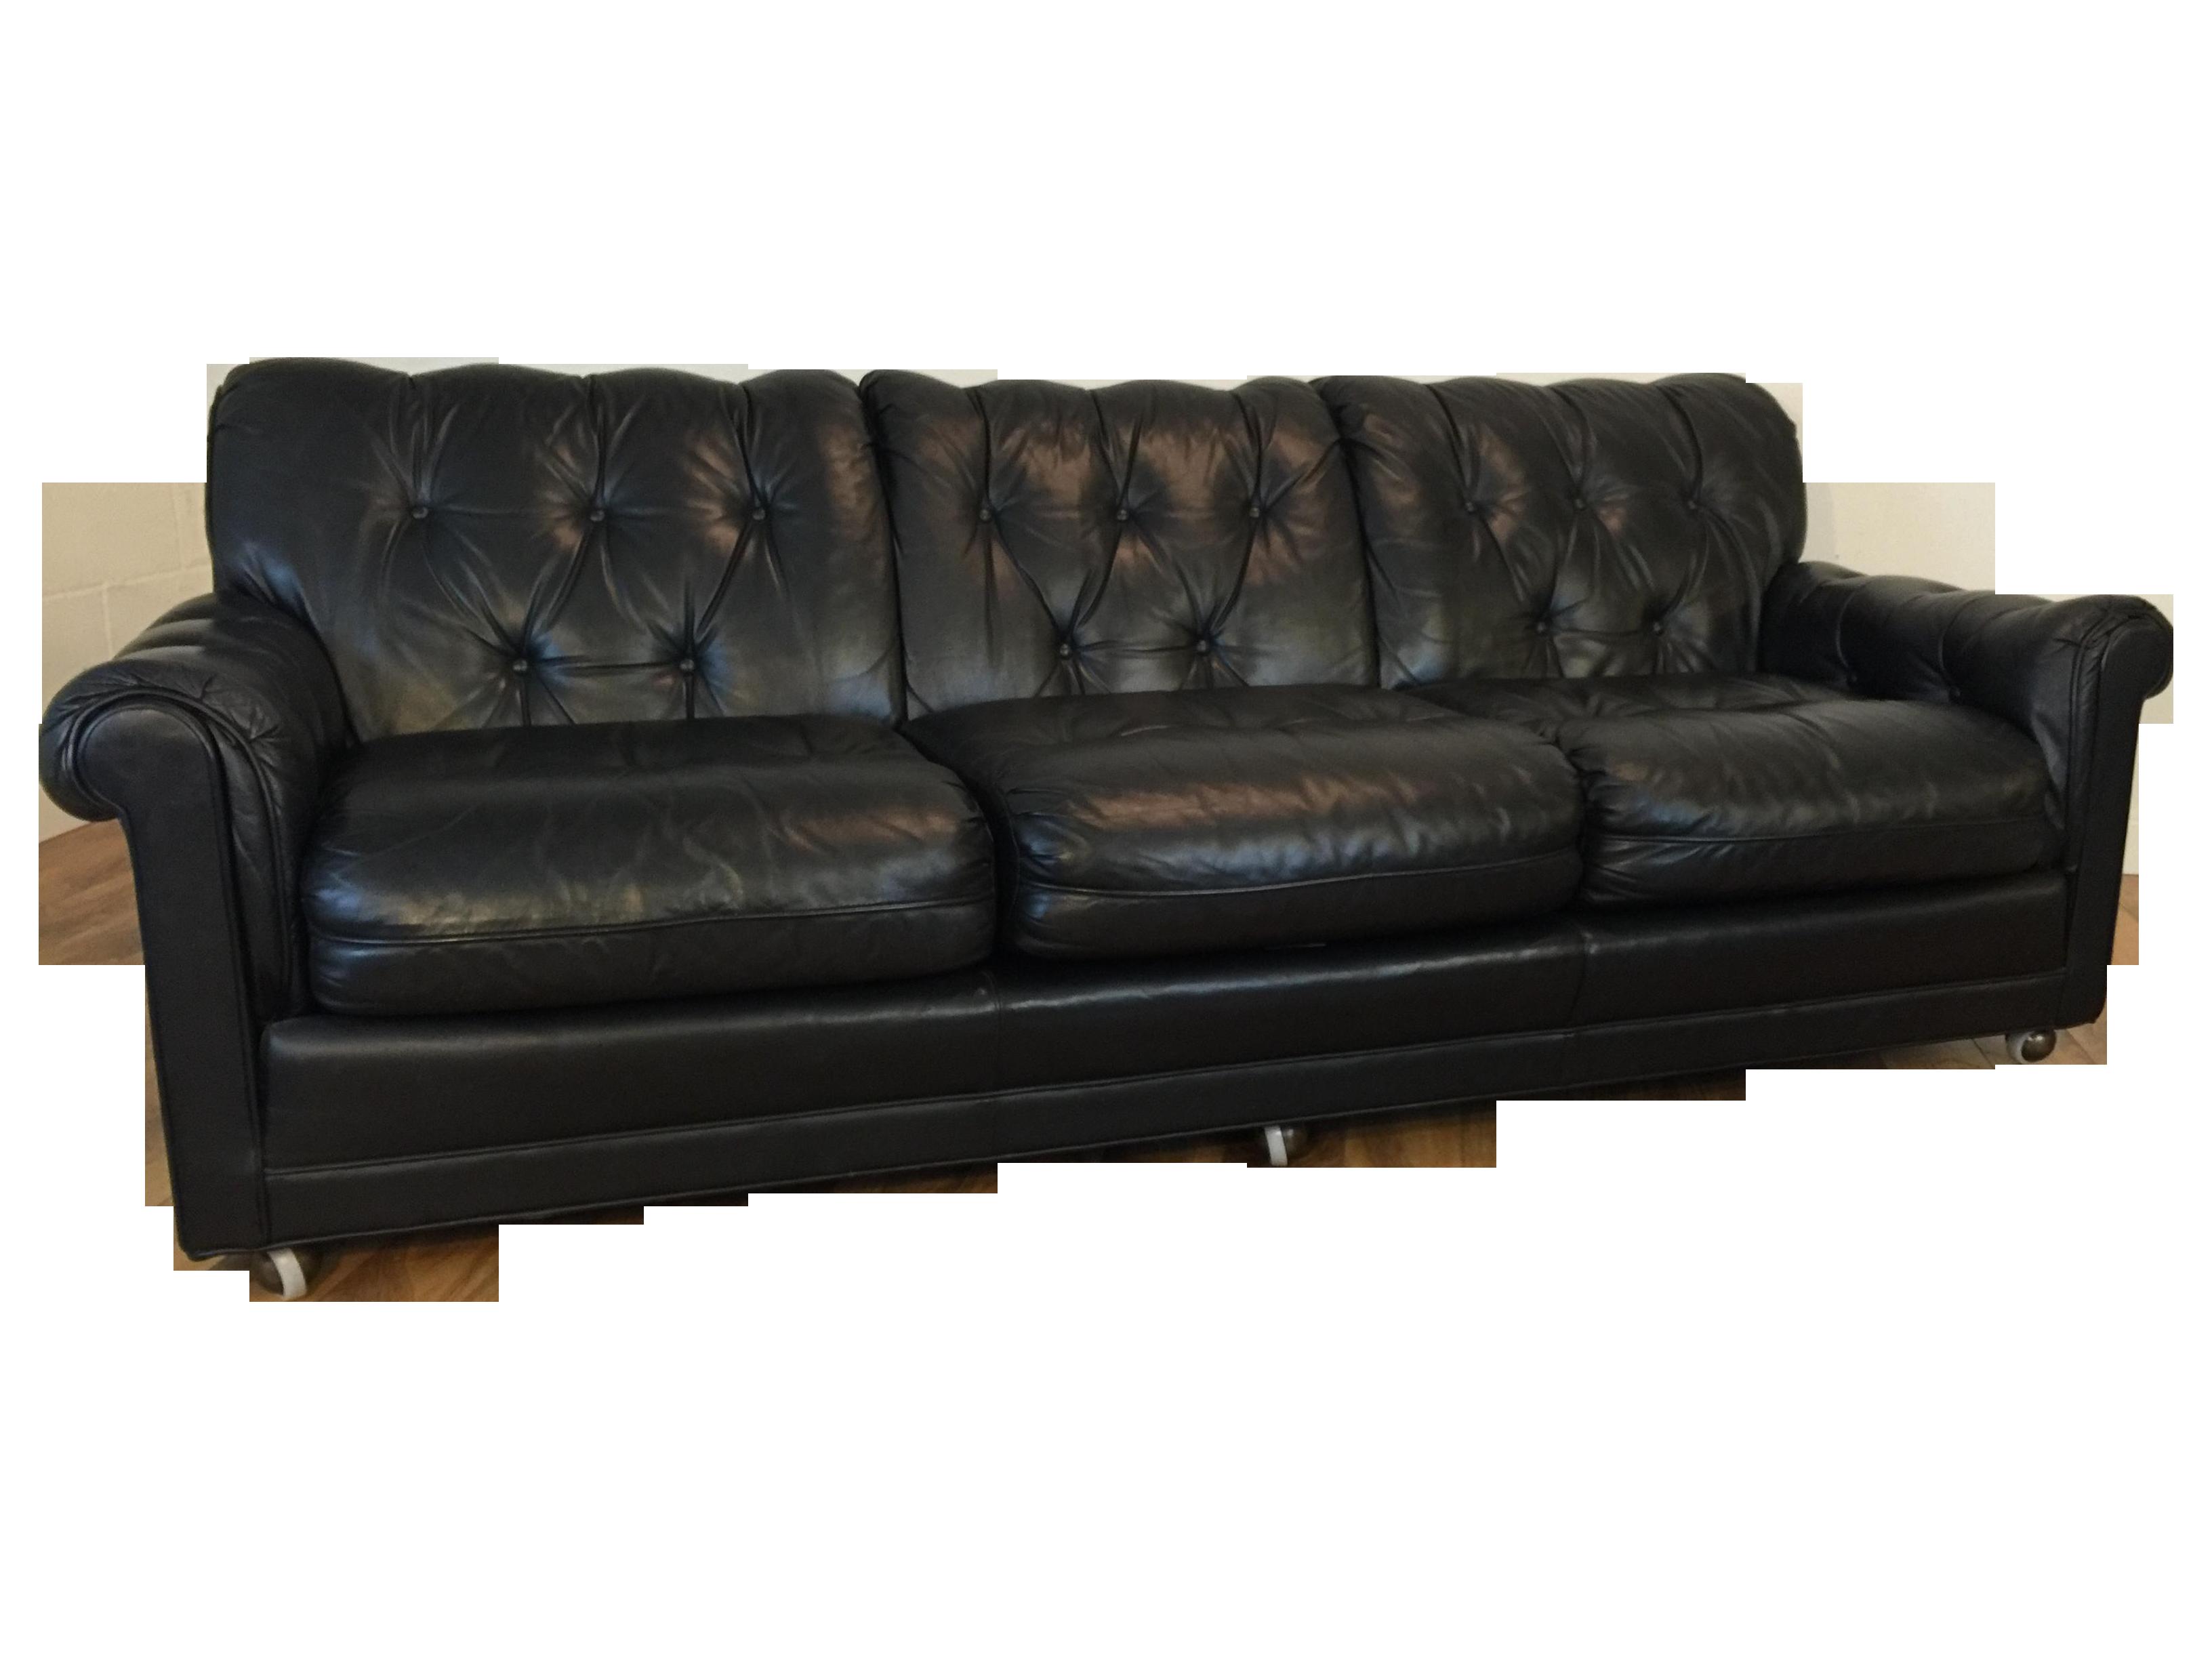 Vintage Leather Sofa By Leathercraft Vintage Leather Sofa Leather Sofa Sofa